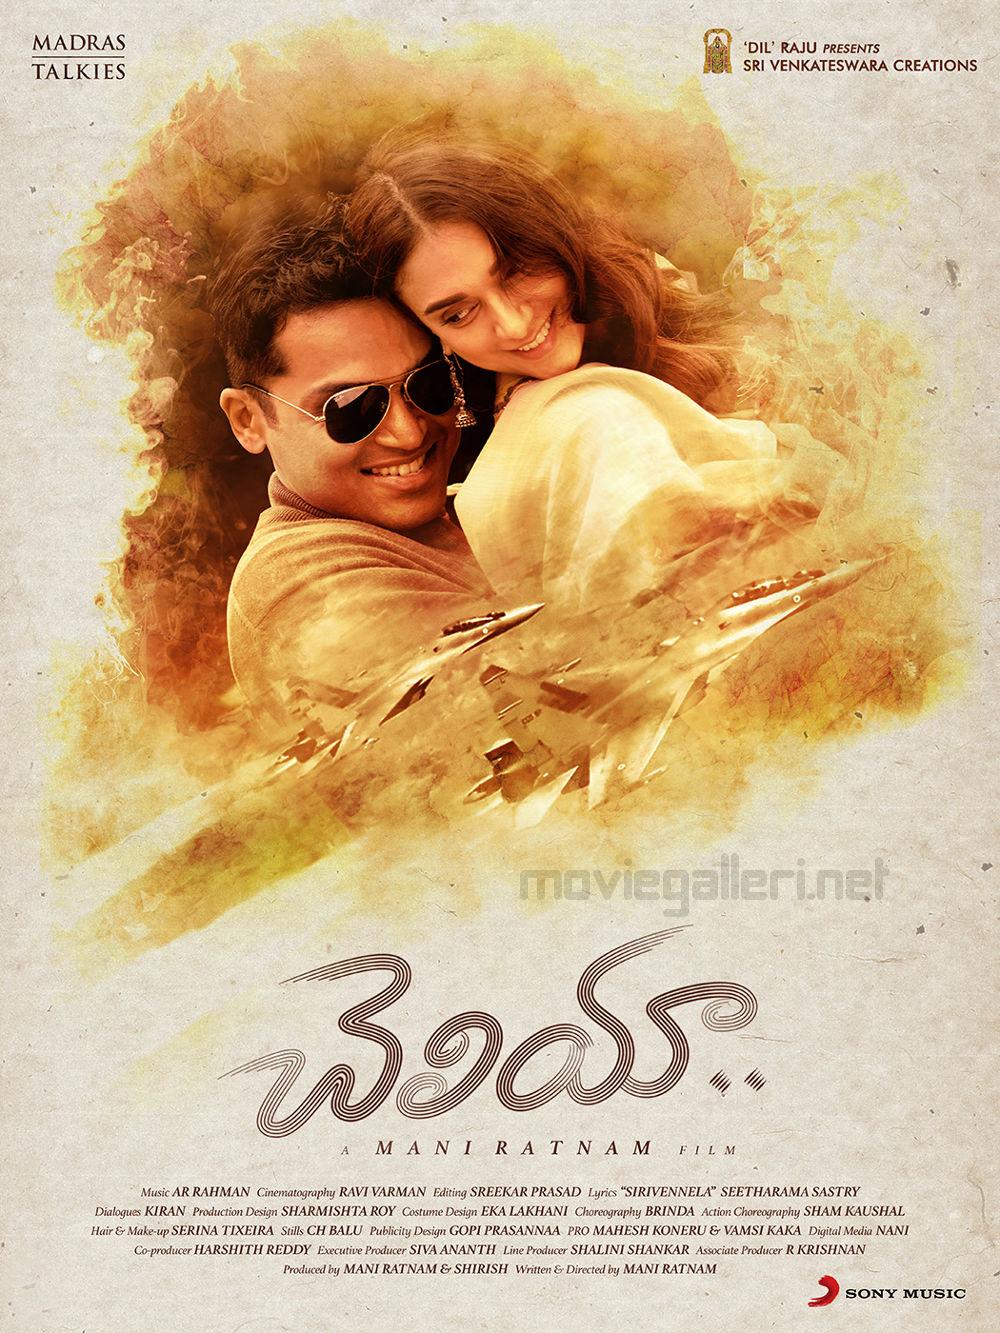 Karthi & Aditi Rao Hydari in Cheliyaa Movie Poster Mani Ratnam - Dil Raju